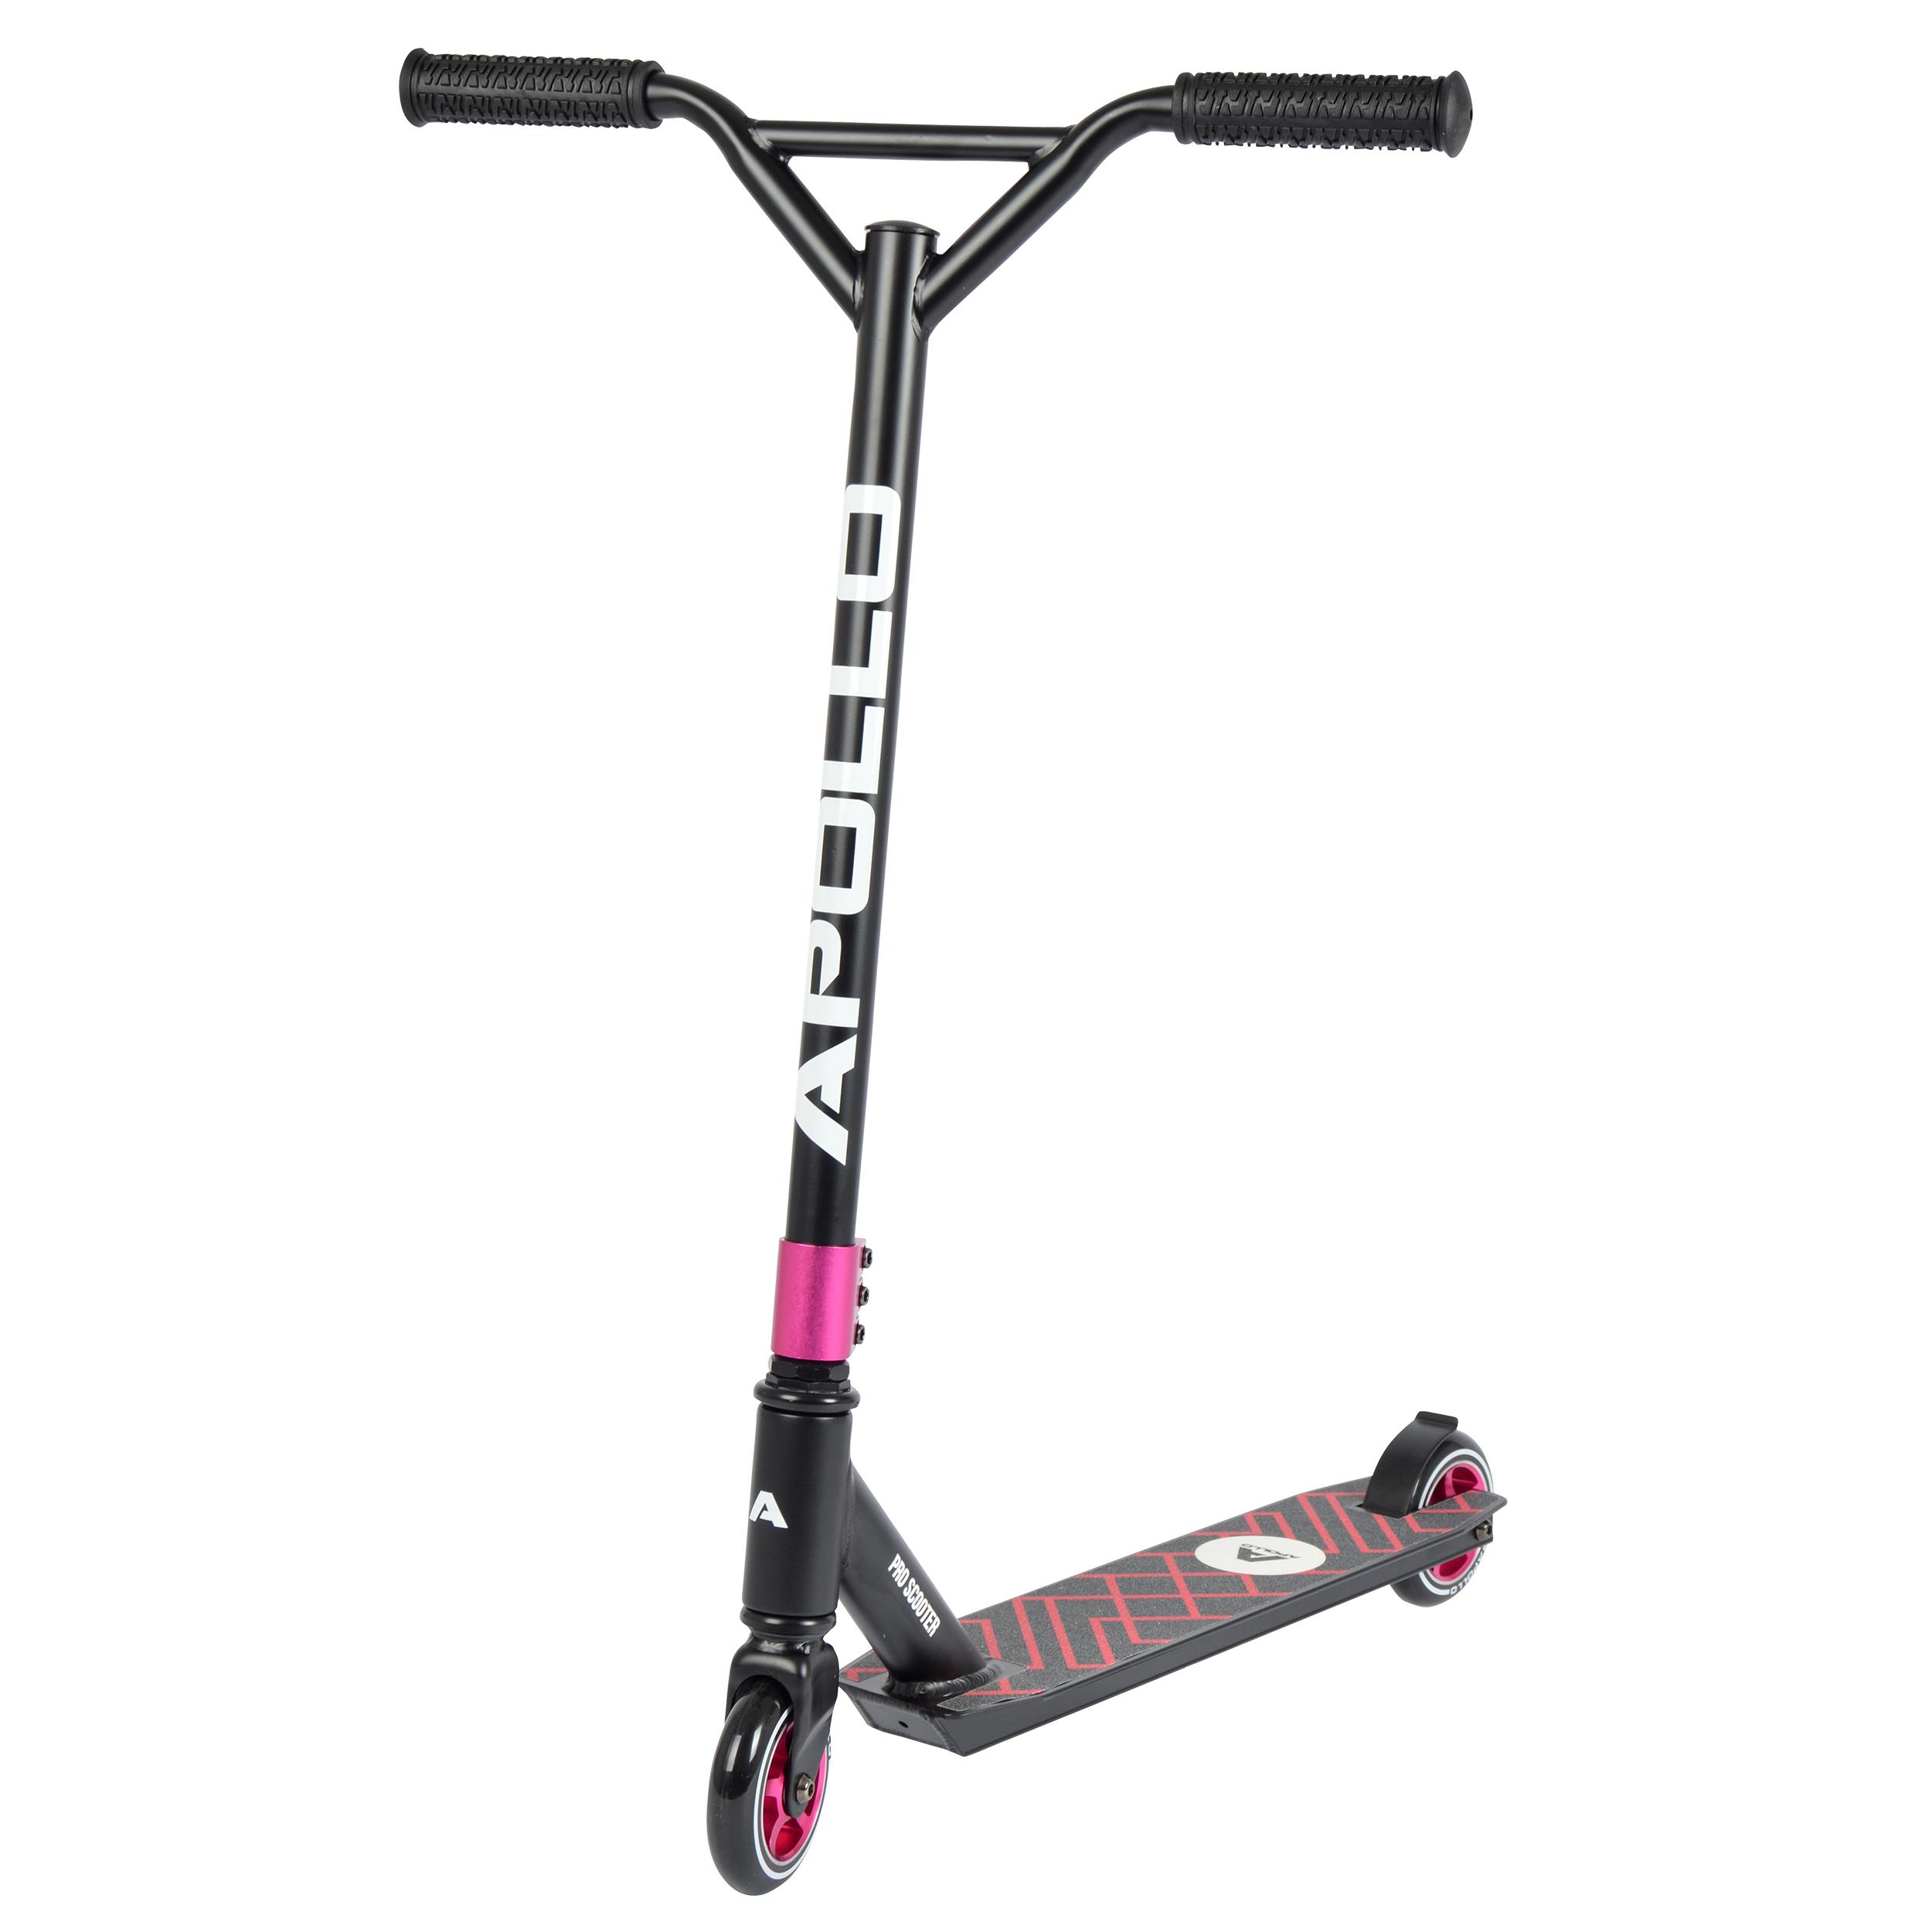 Stunt Scooter - Genius Pro - Pink